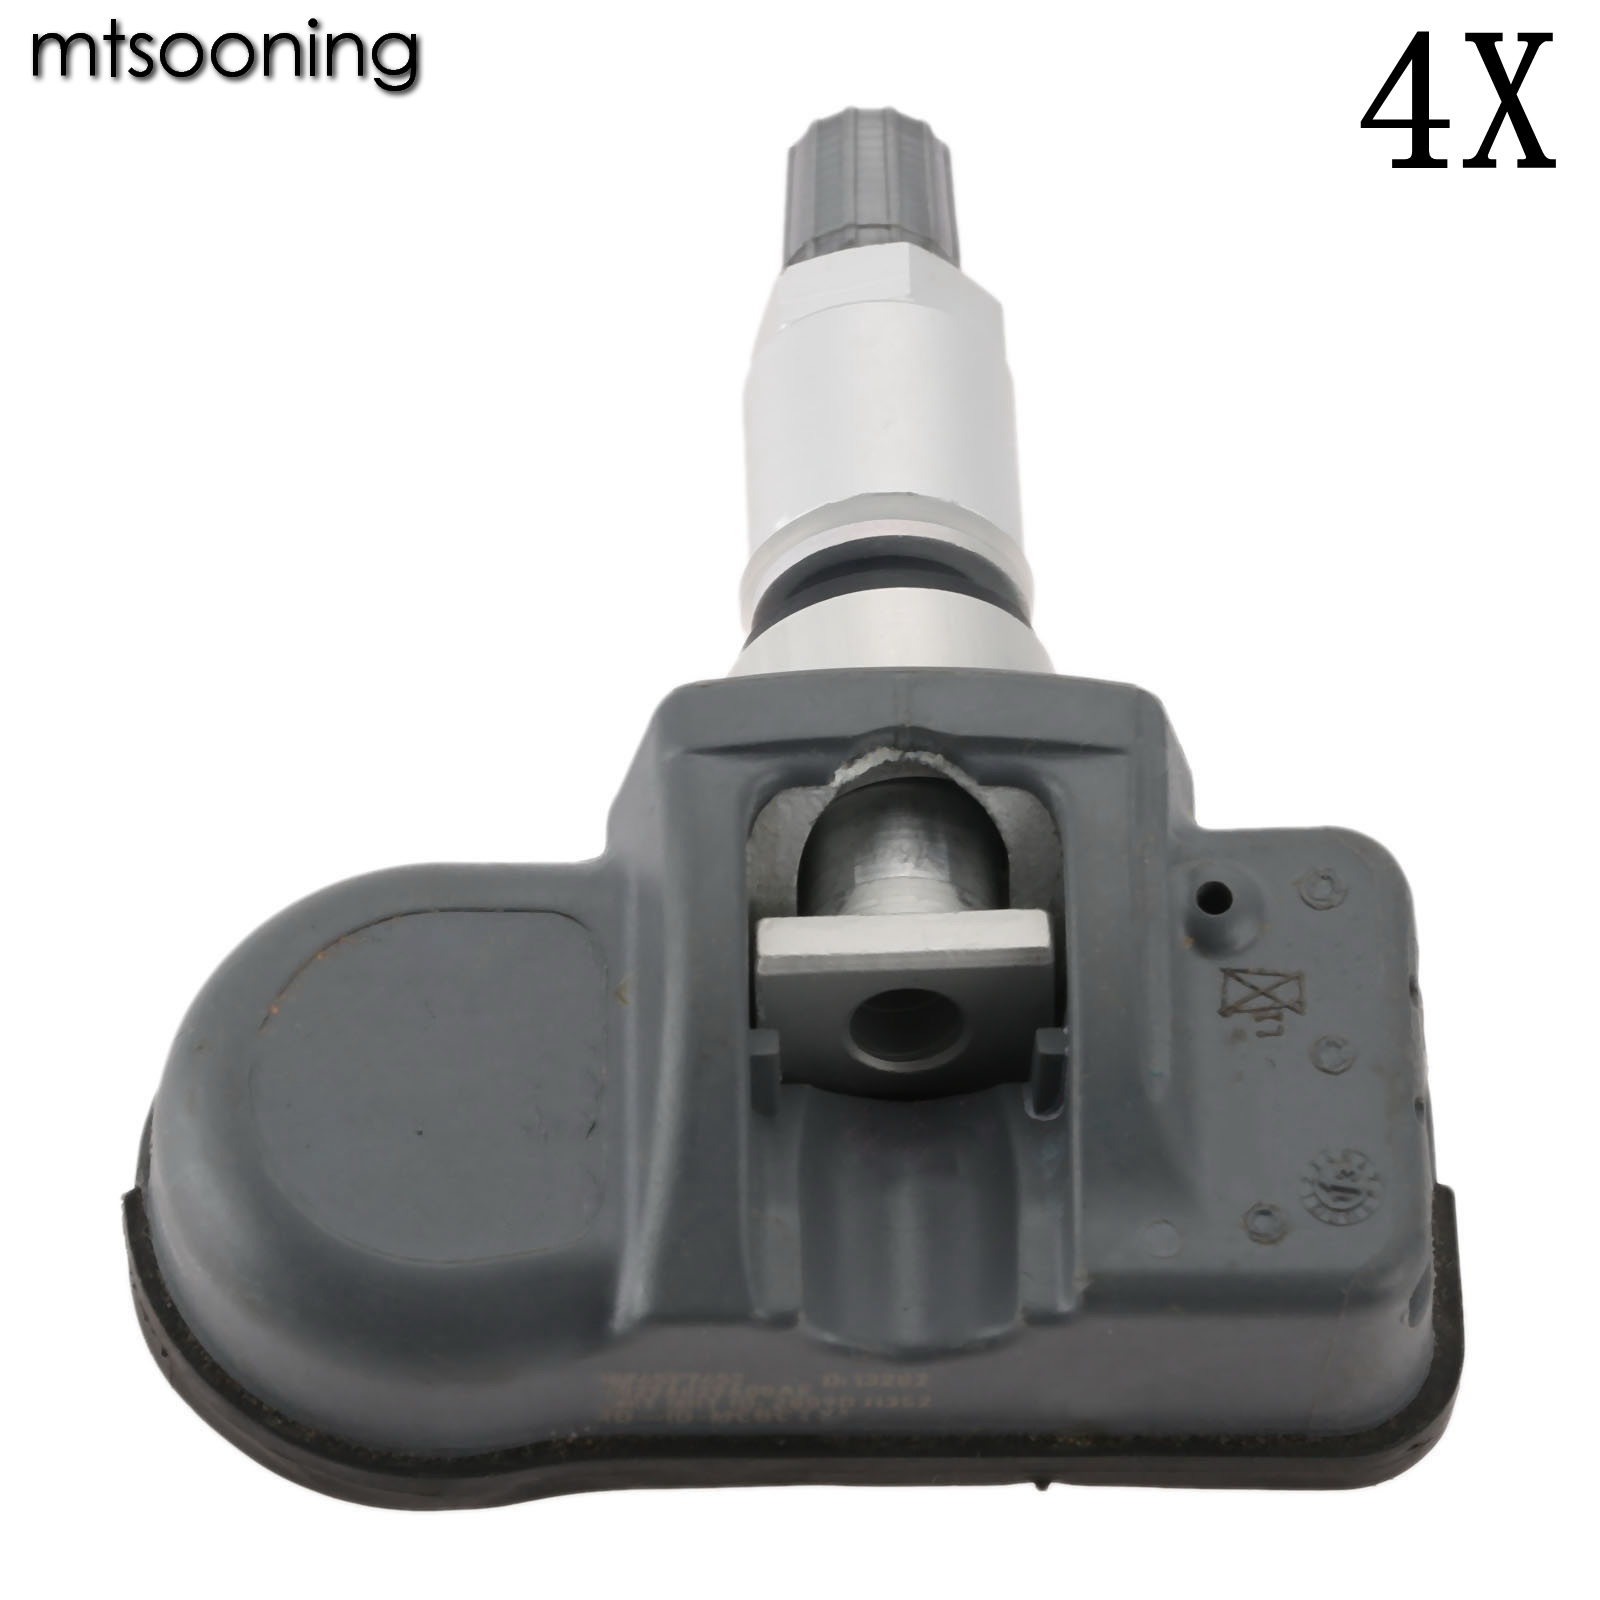 mtsooning 4Pcs TPMS Tire Pressure Sensor 56029400AE 433 92 MHz New For Mercedes Benz Chrysler Dodge